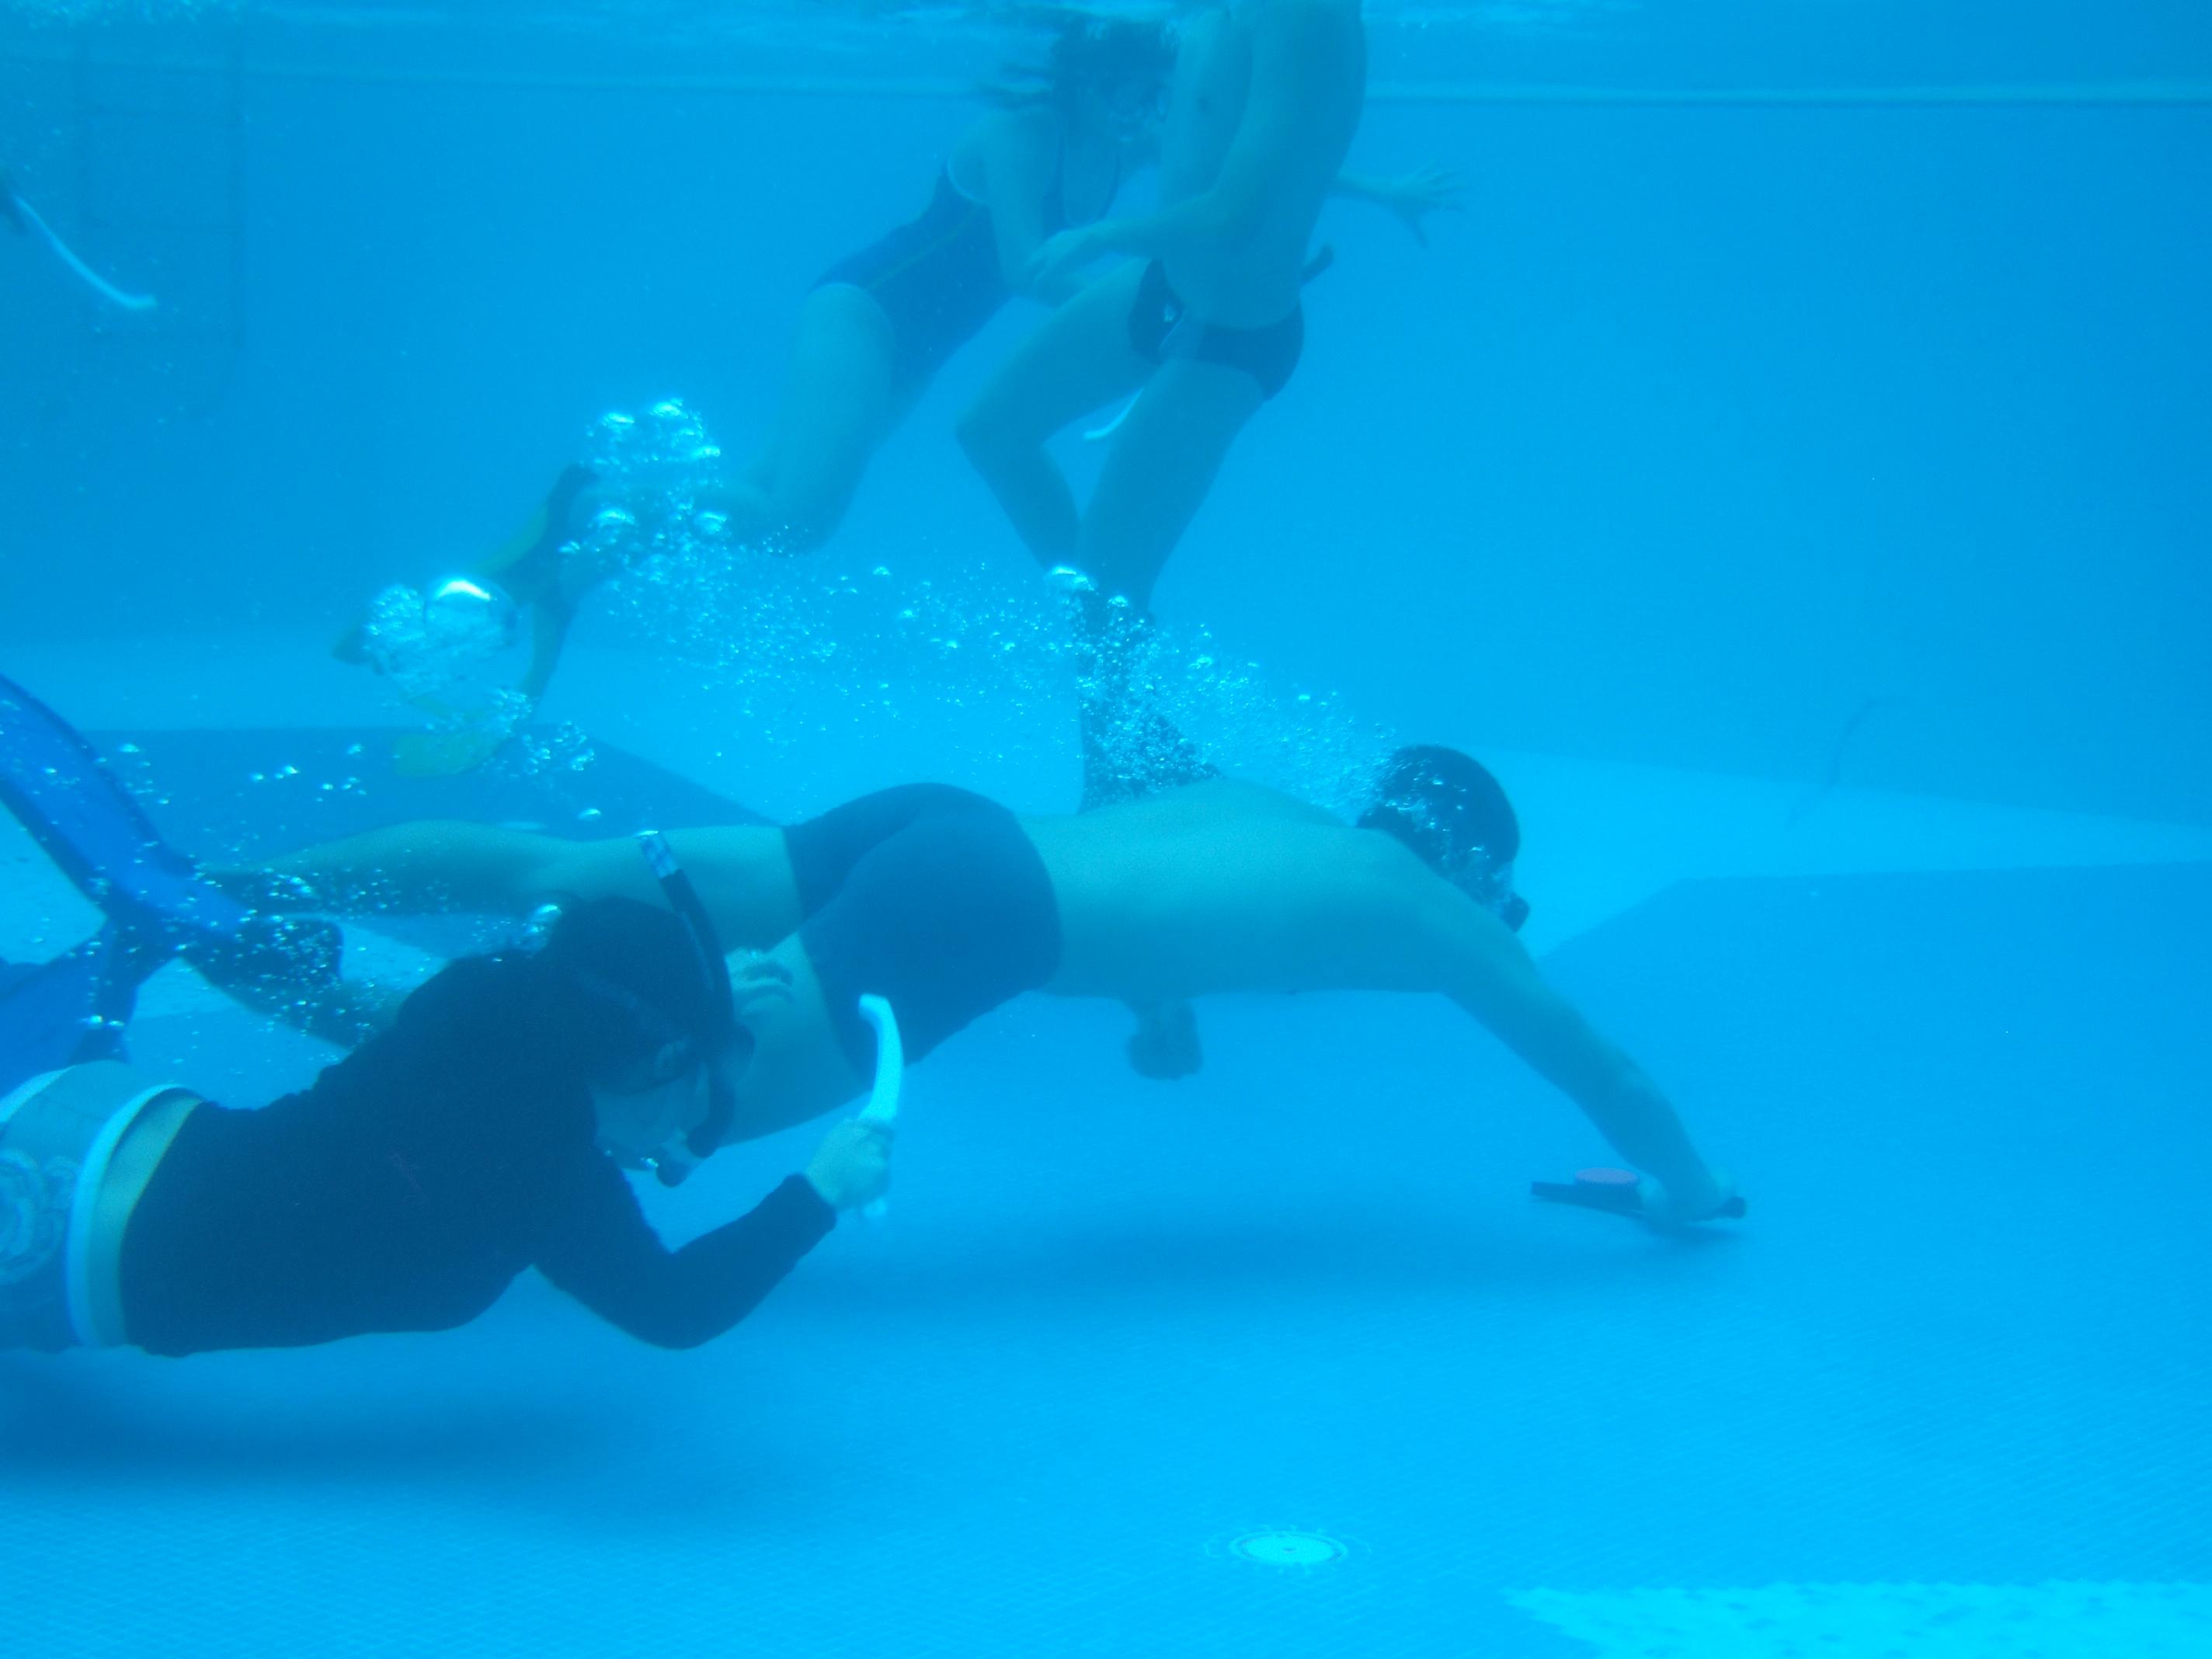 Sun u underwater pool 37 images